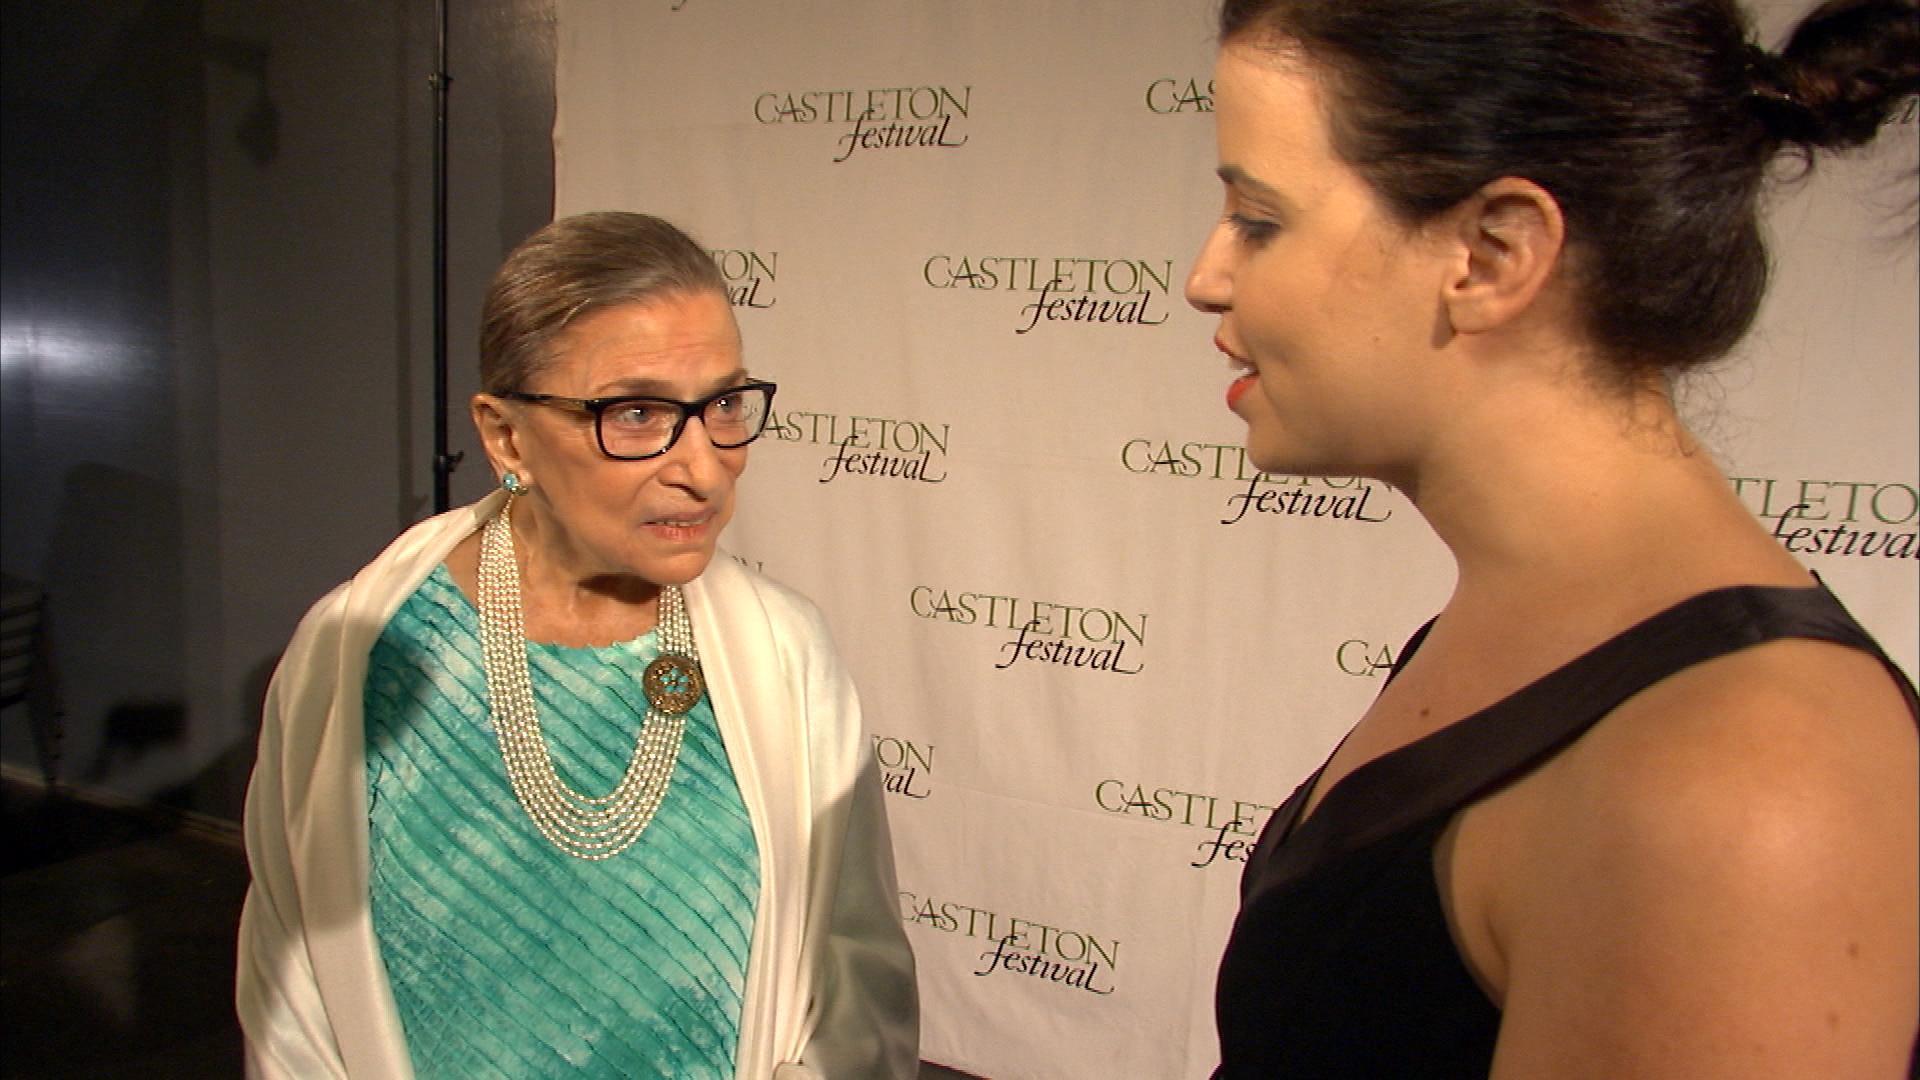 Scalia, Ginsburg unite in taste for opera